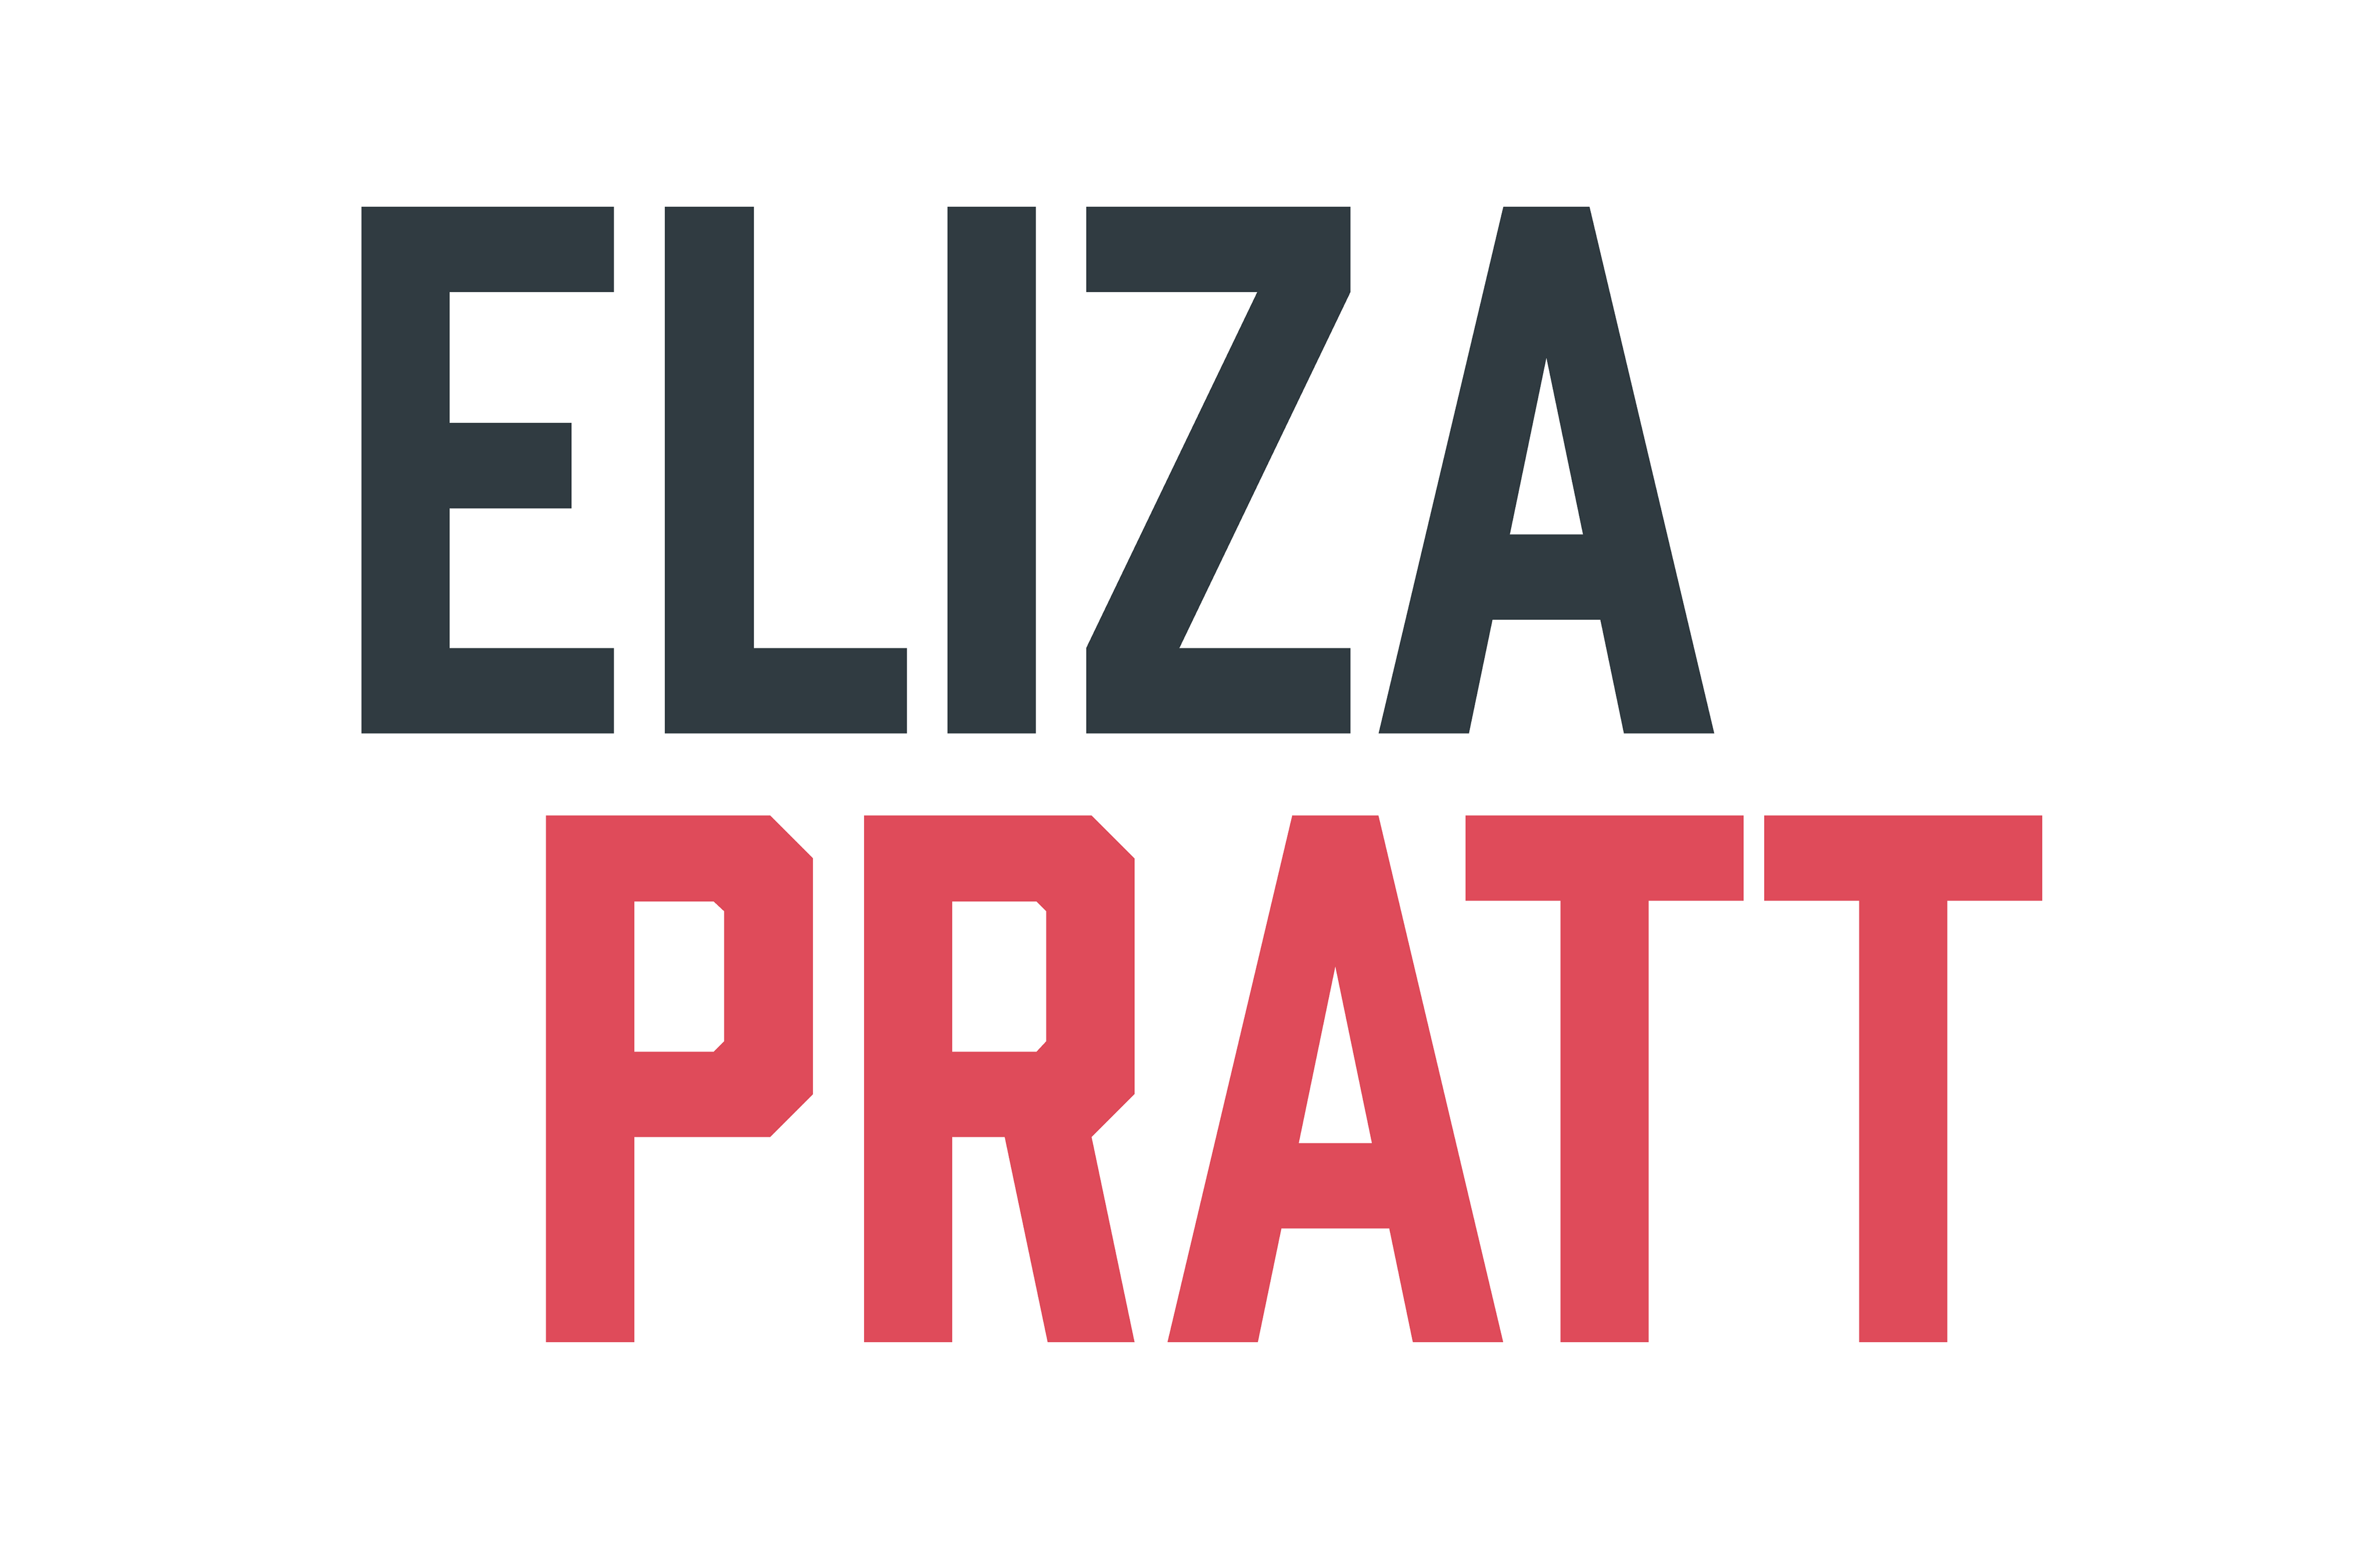 Eliza Pratt